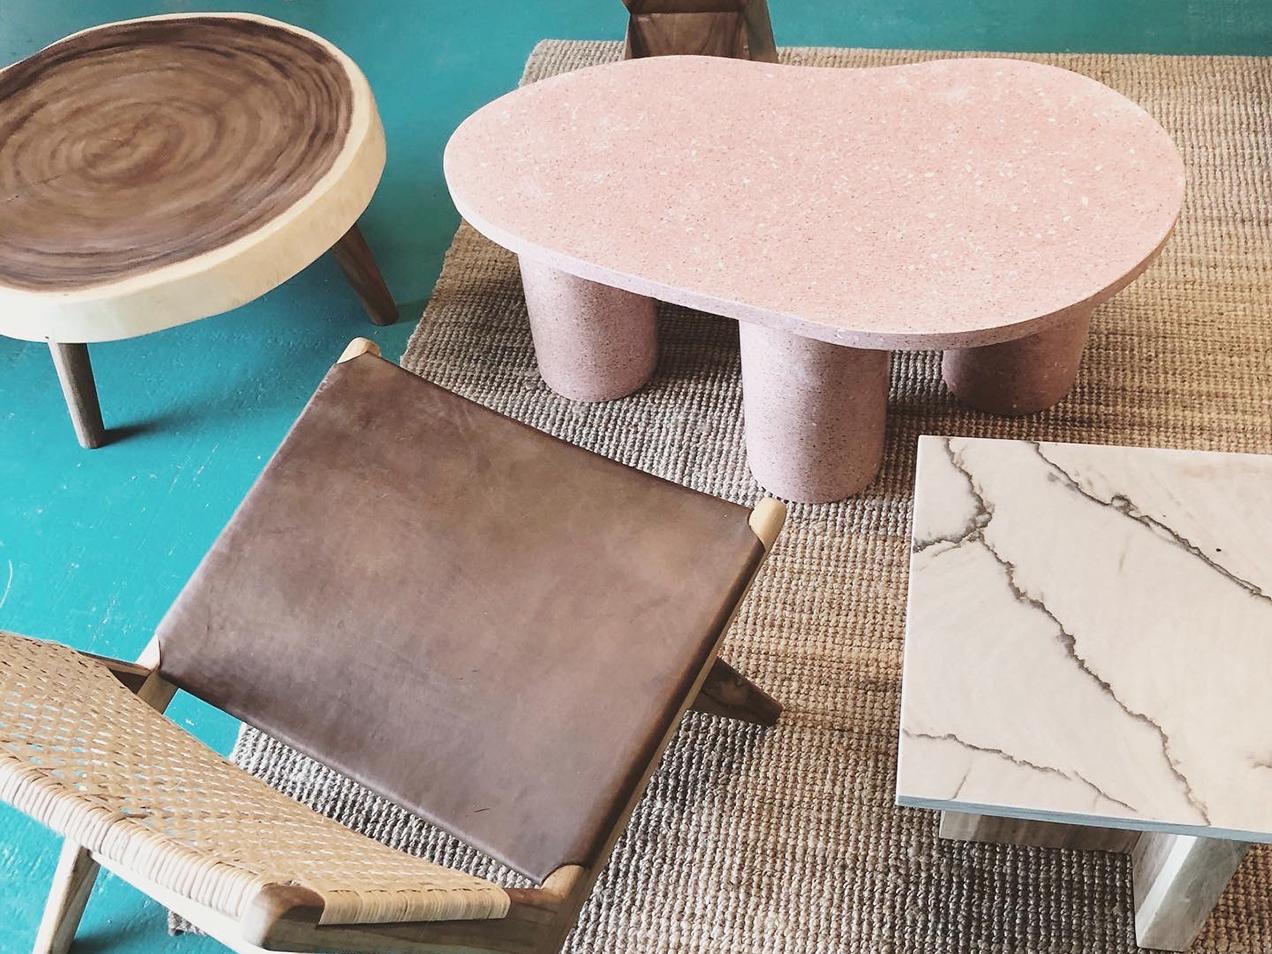 Terrazzo bord, sofabord, sidebord, kidney shape, rosa terrasso, marmor